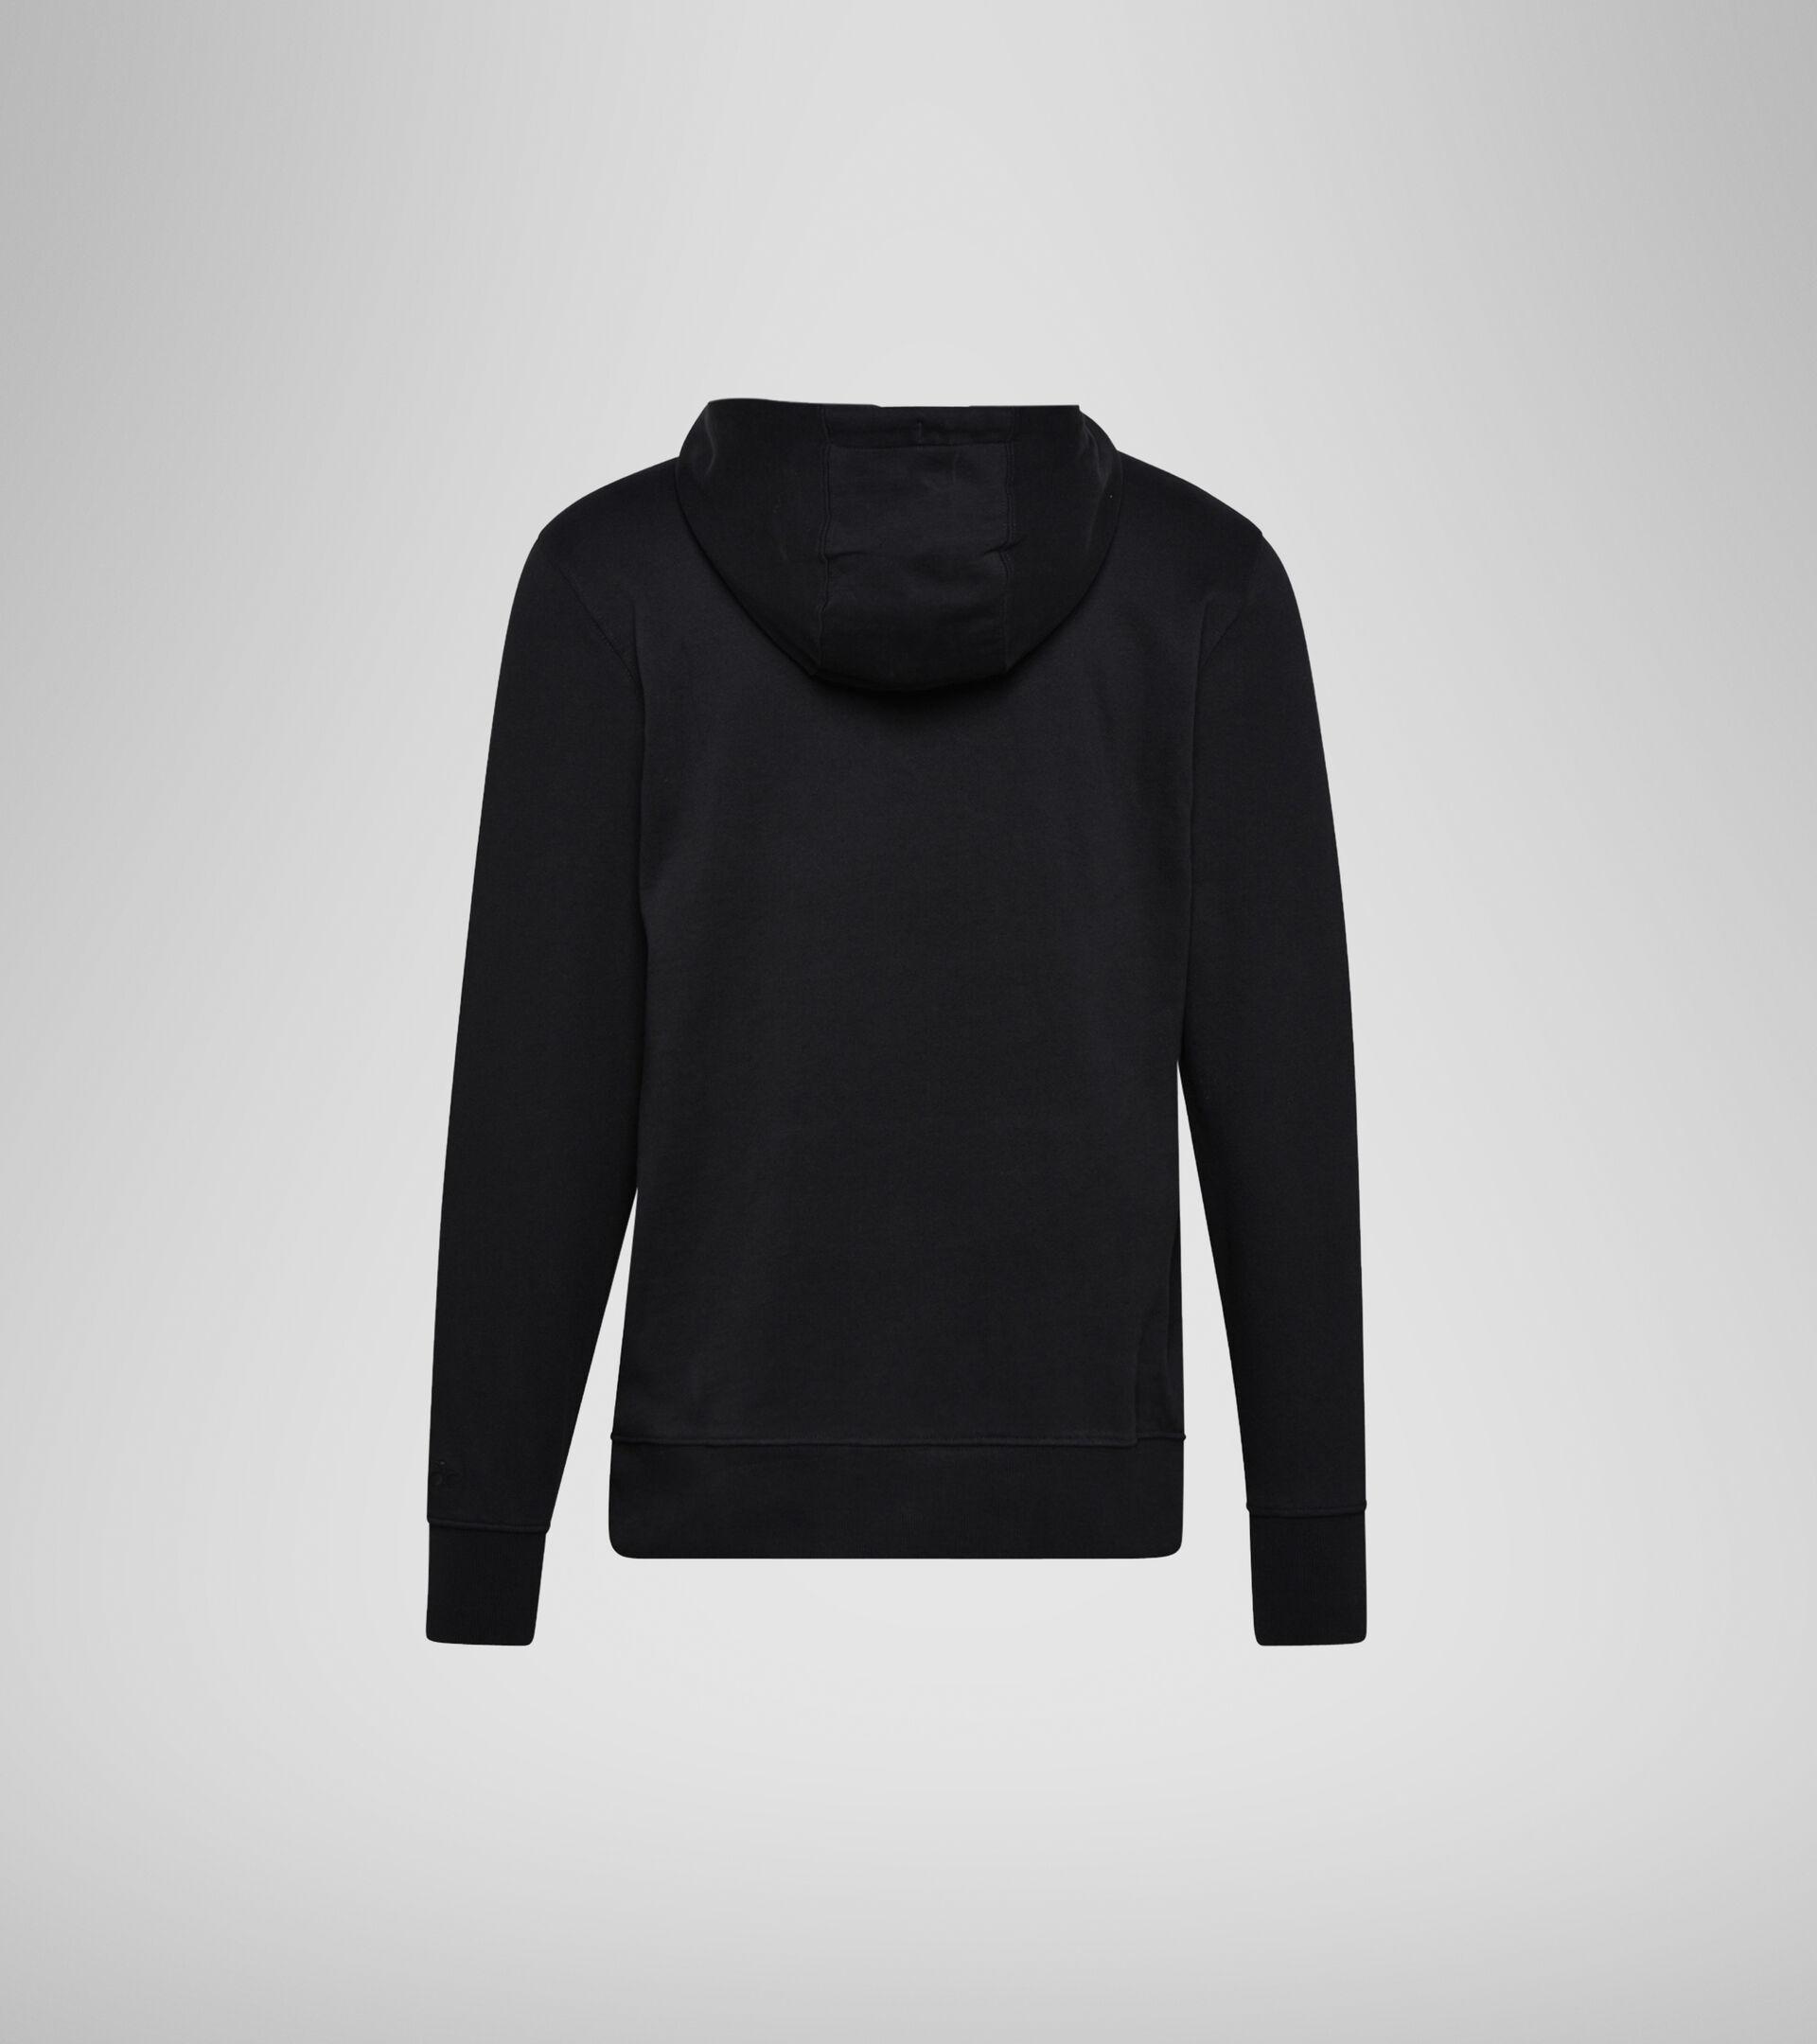 Apparel Sportswear UOMO HOODIE SPECTRA NEGRO/VERDE VIRIDIAN/BLCO LECH Diadora